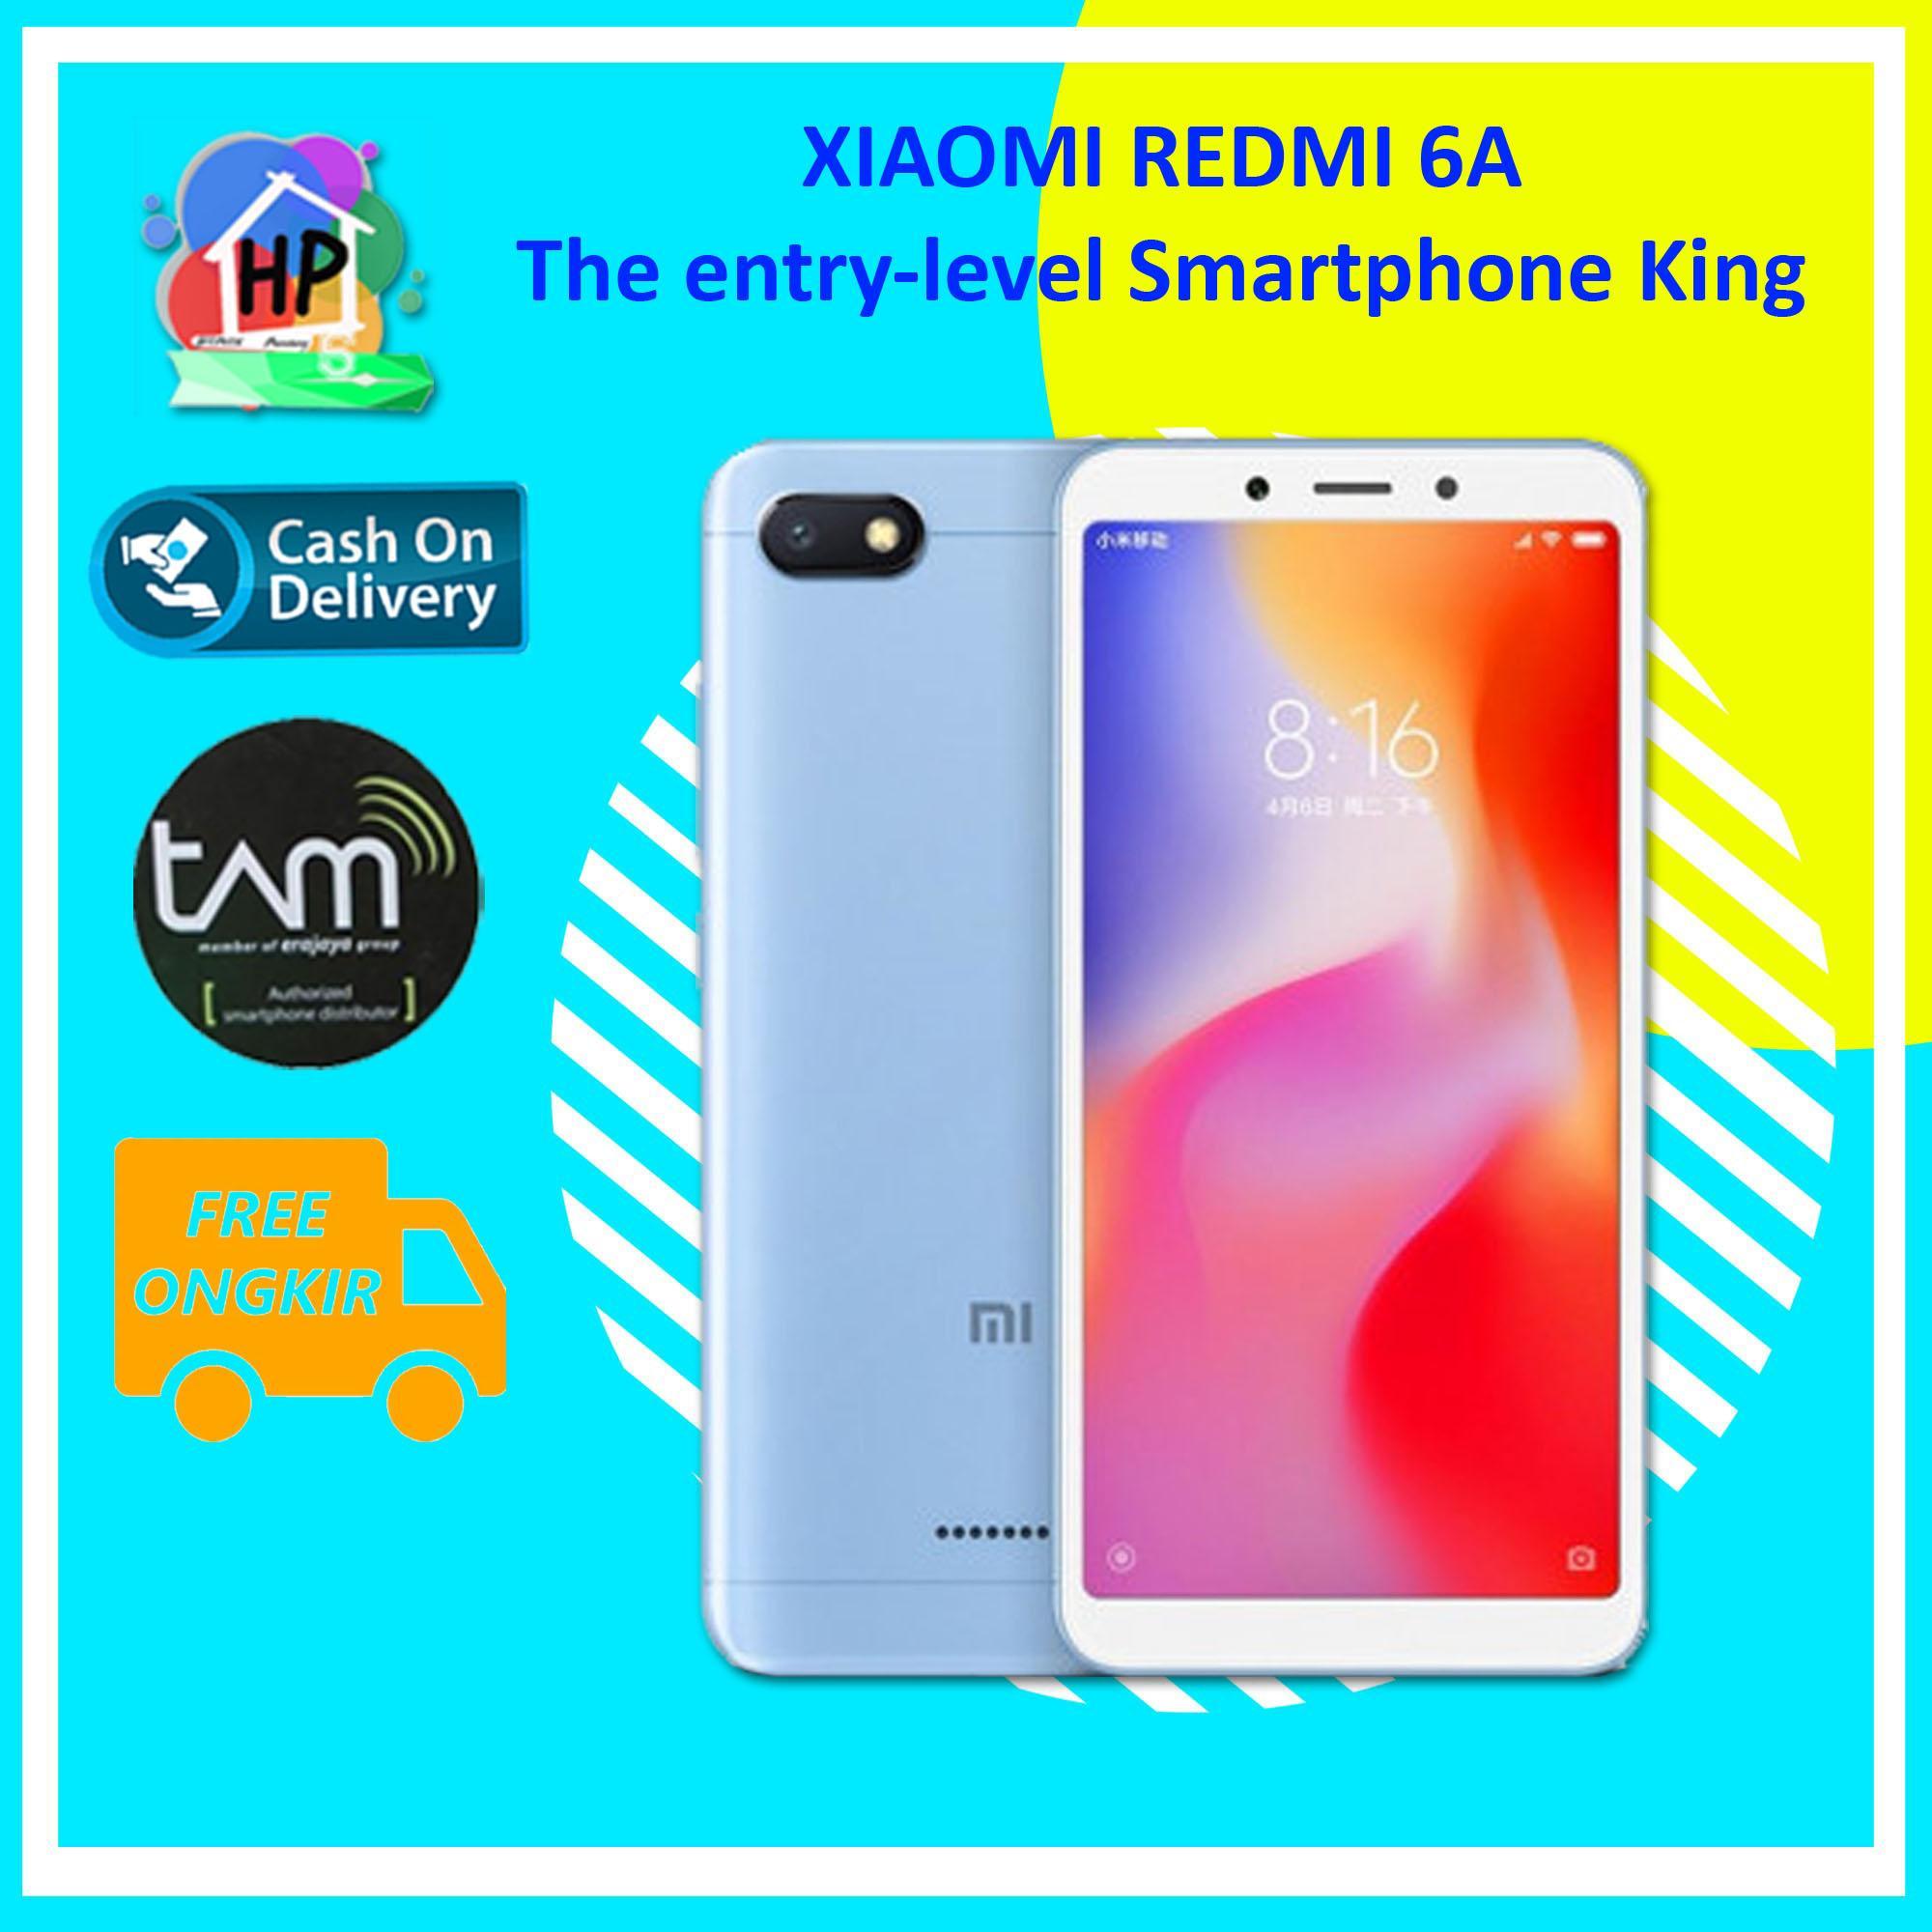 Xiaomi Redmi 6A Smartphone - COD [16GB / 2GB / Resmi TAM] + Gratis Ongkir